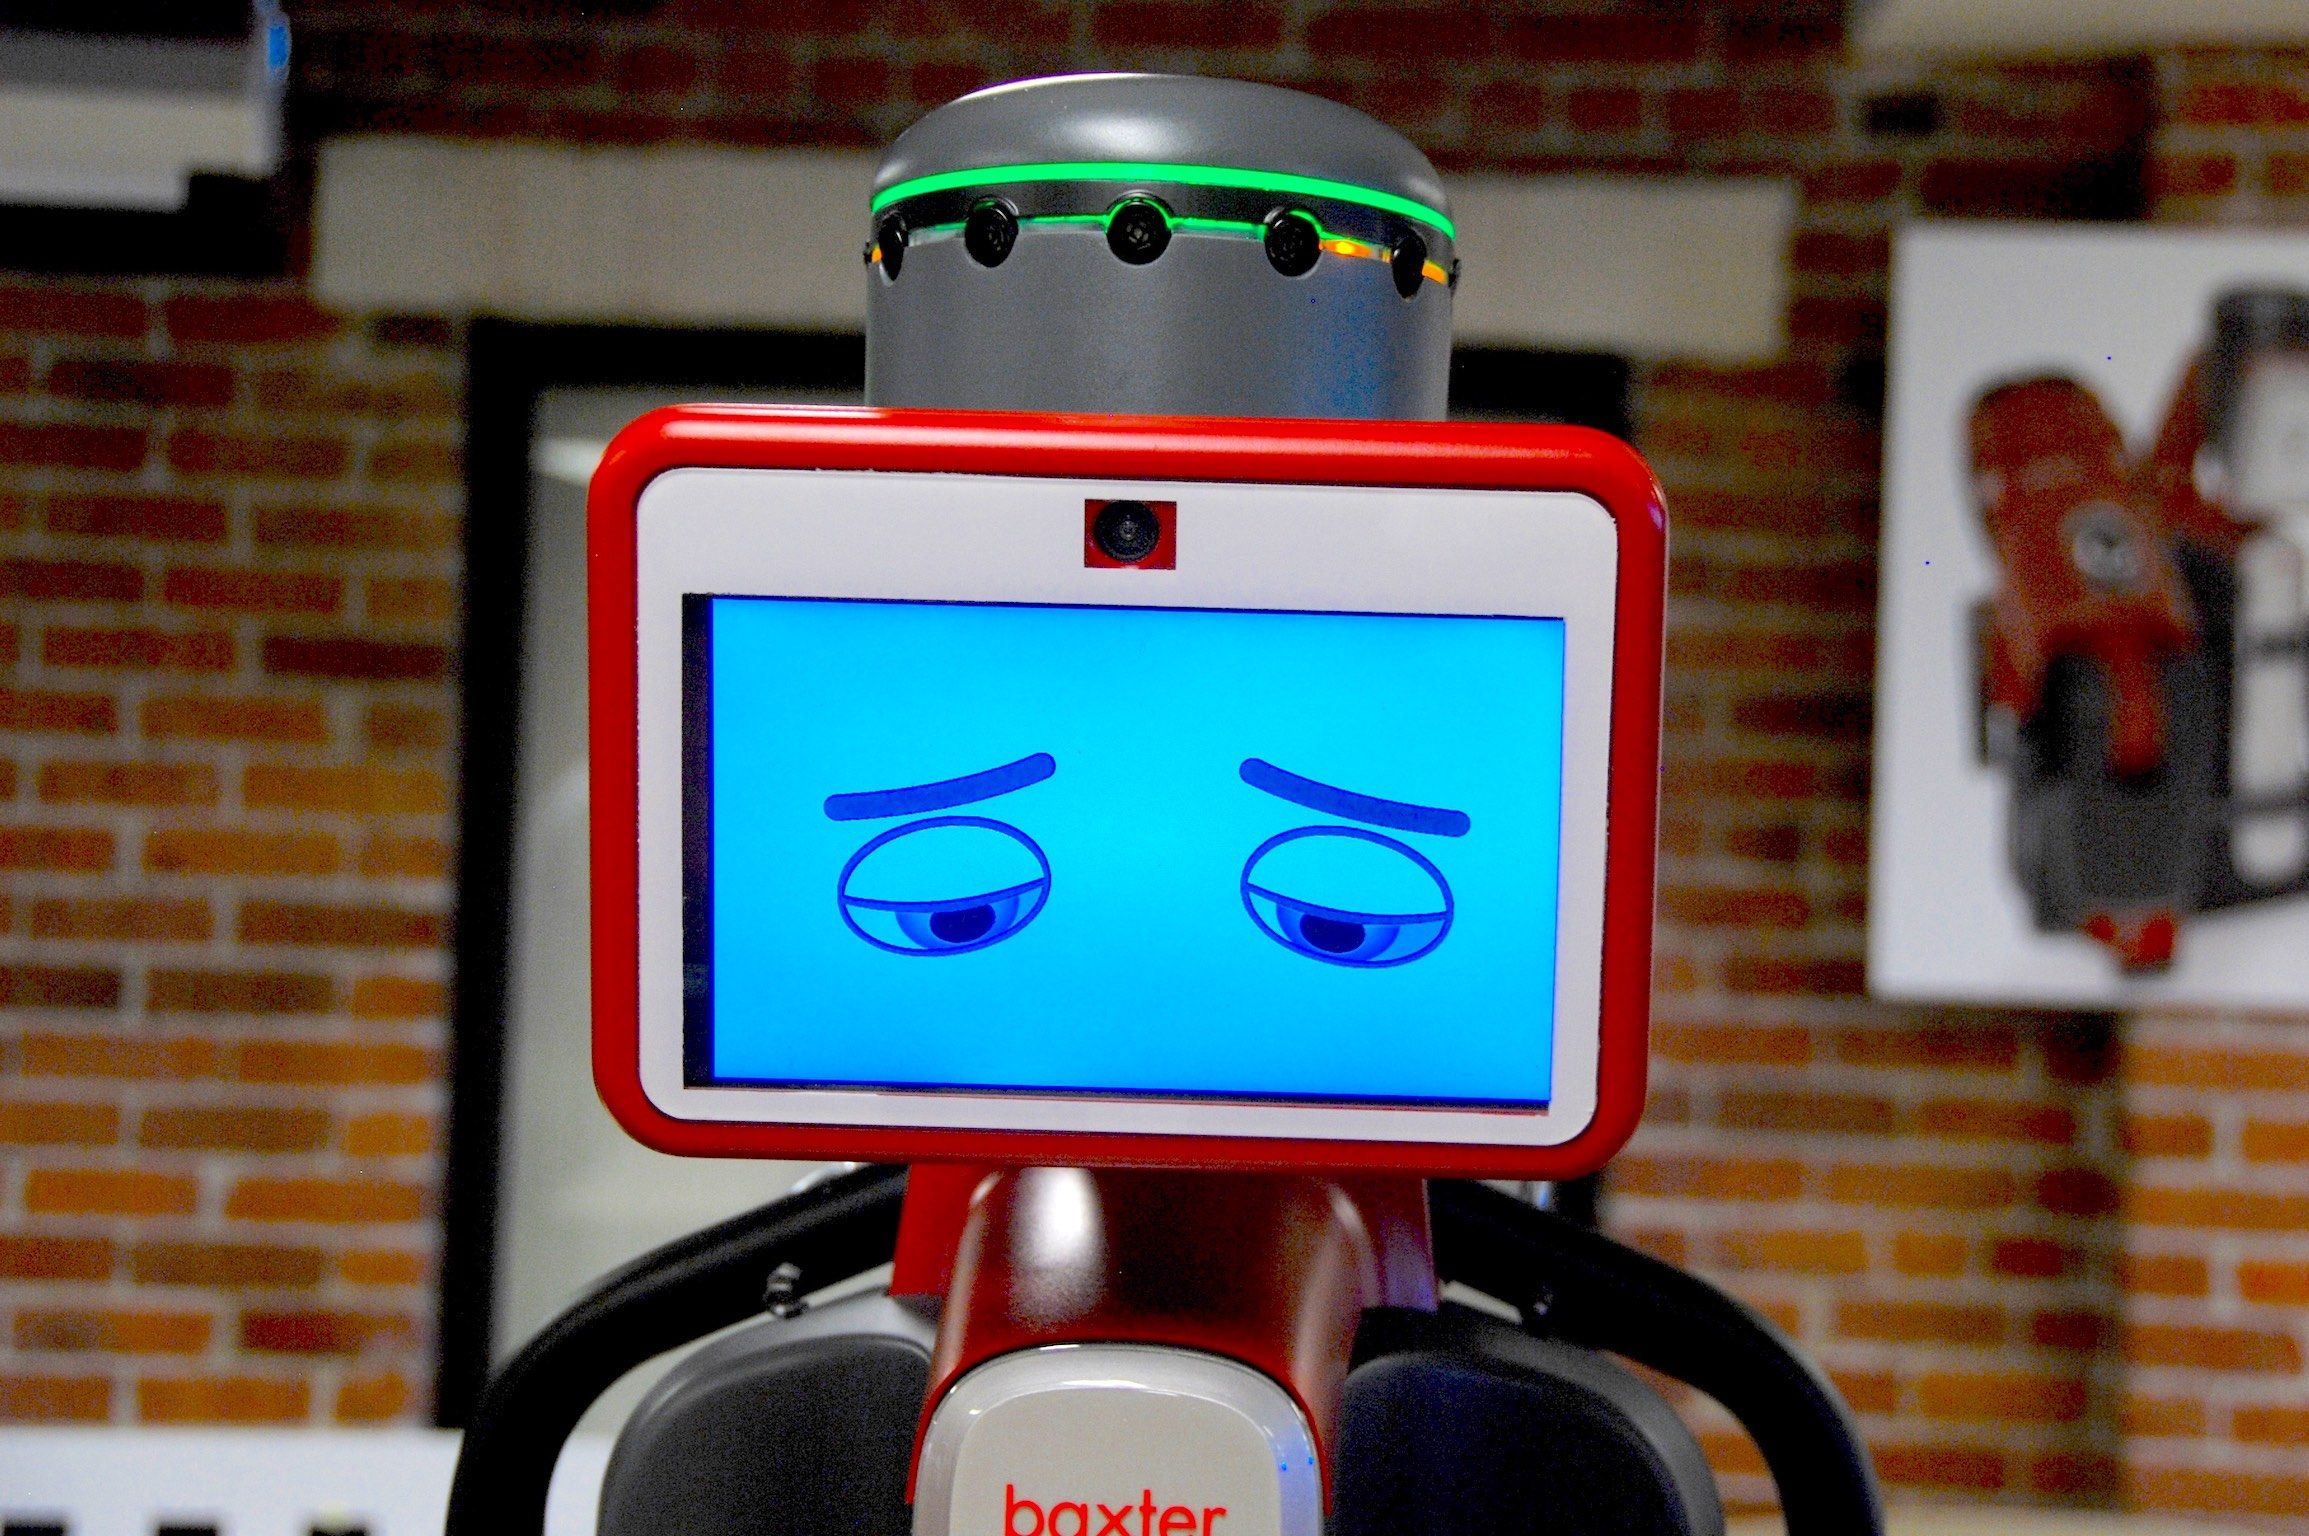 Rethink Robotics' Baxter collaborative robot